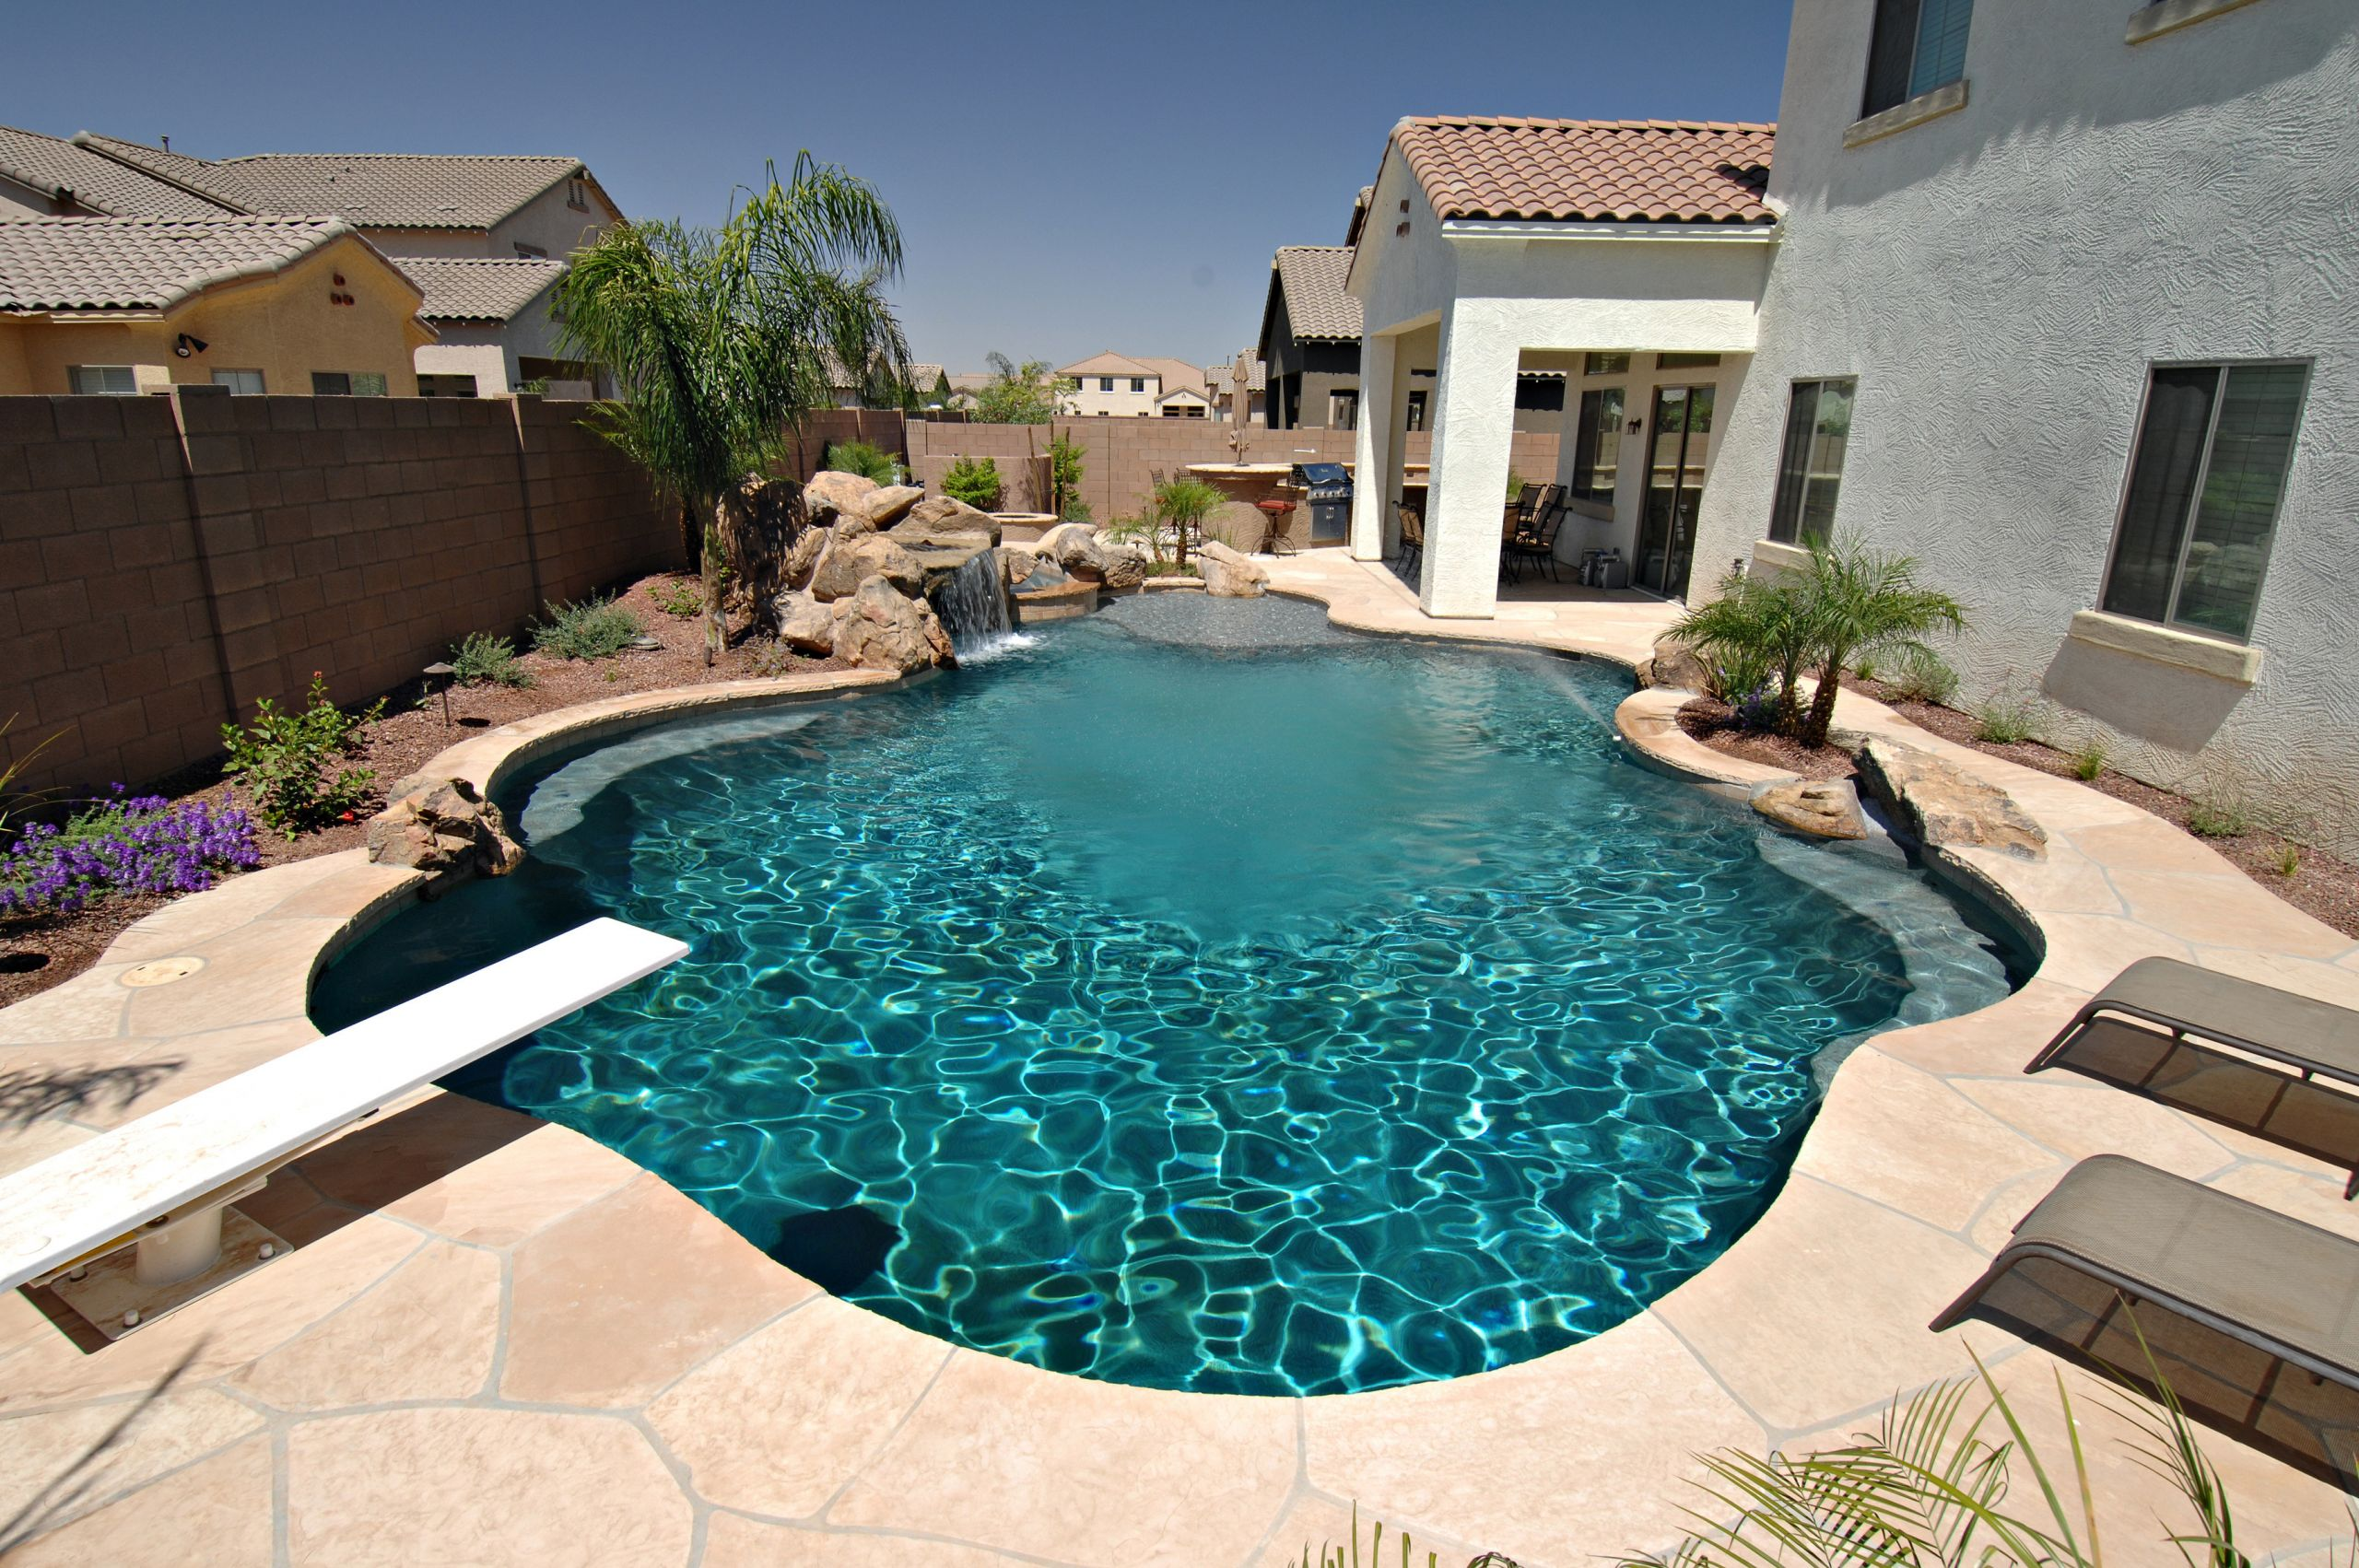 Outdoor Landscape Pool  Backyard Landscaping Ideas Swimming Pool Design